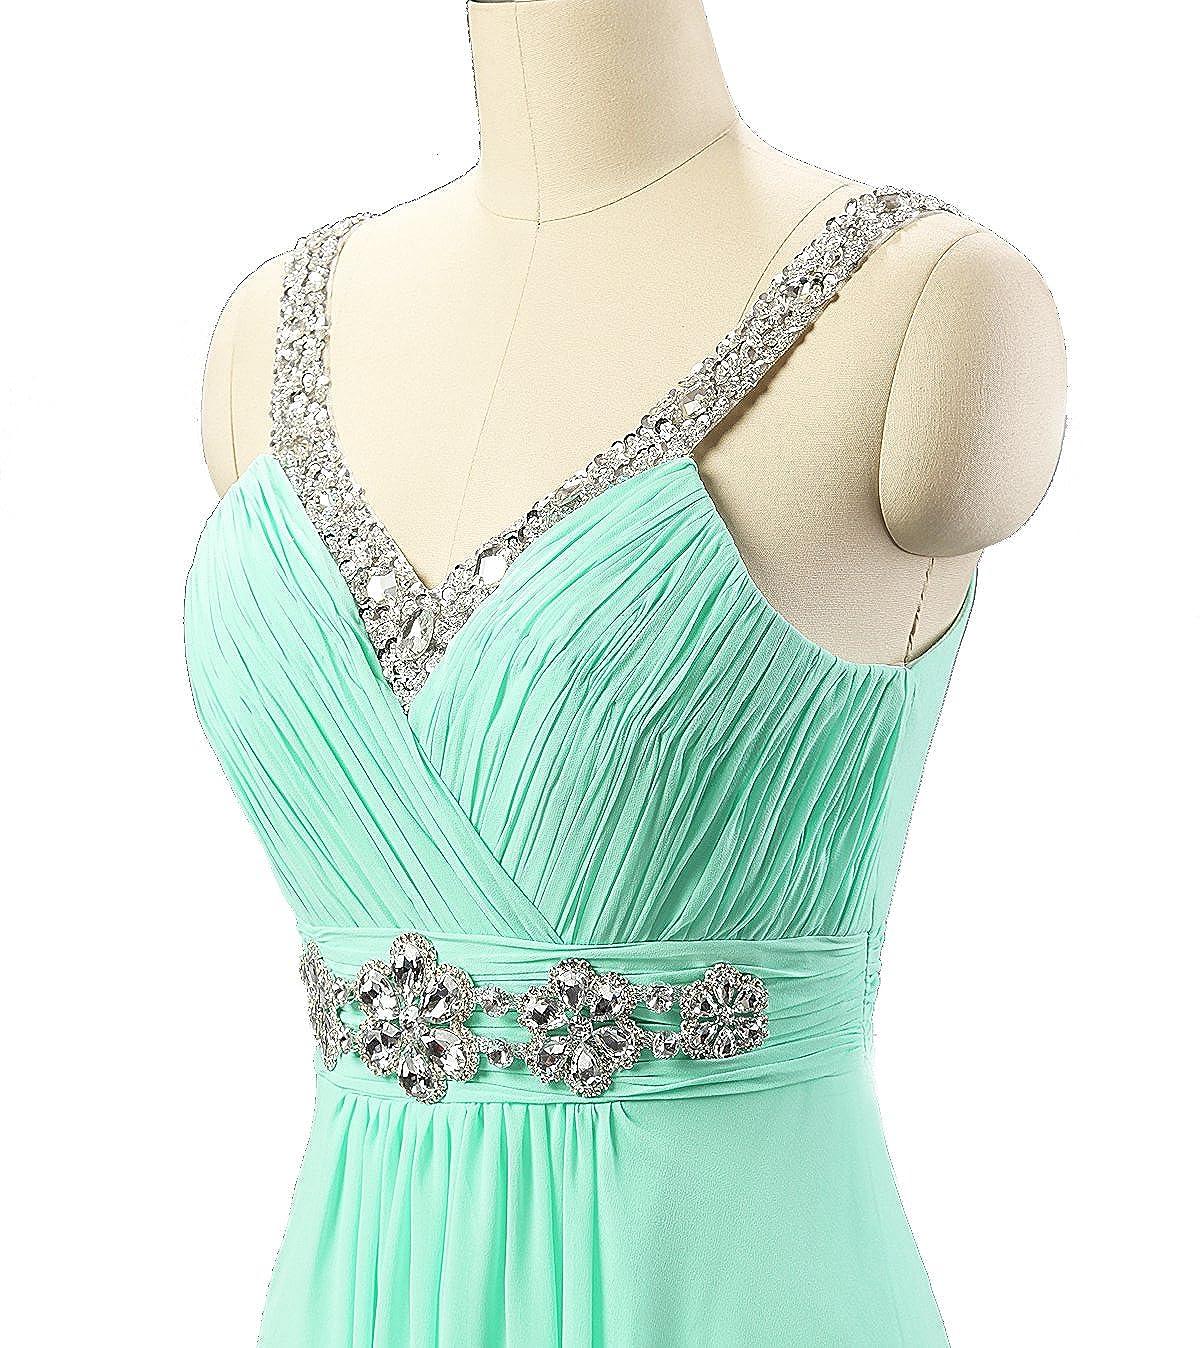 Kmformals Womens Beaded Crystals Prom Dress Bridesmaid Dresses at Amazon Womens Clothing store: